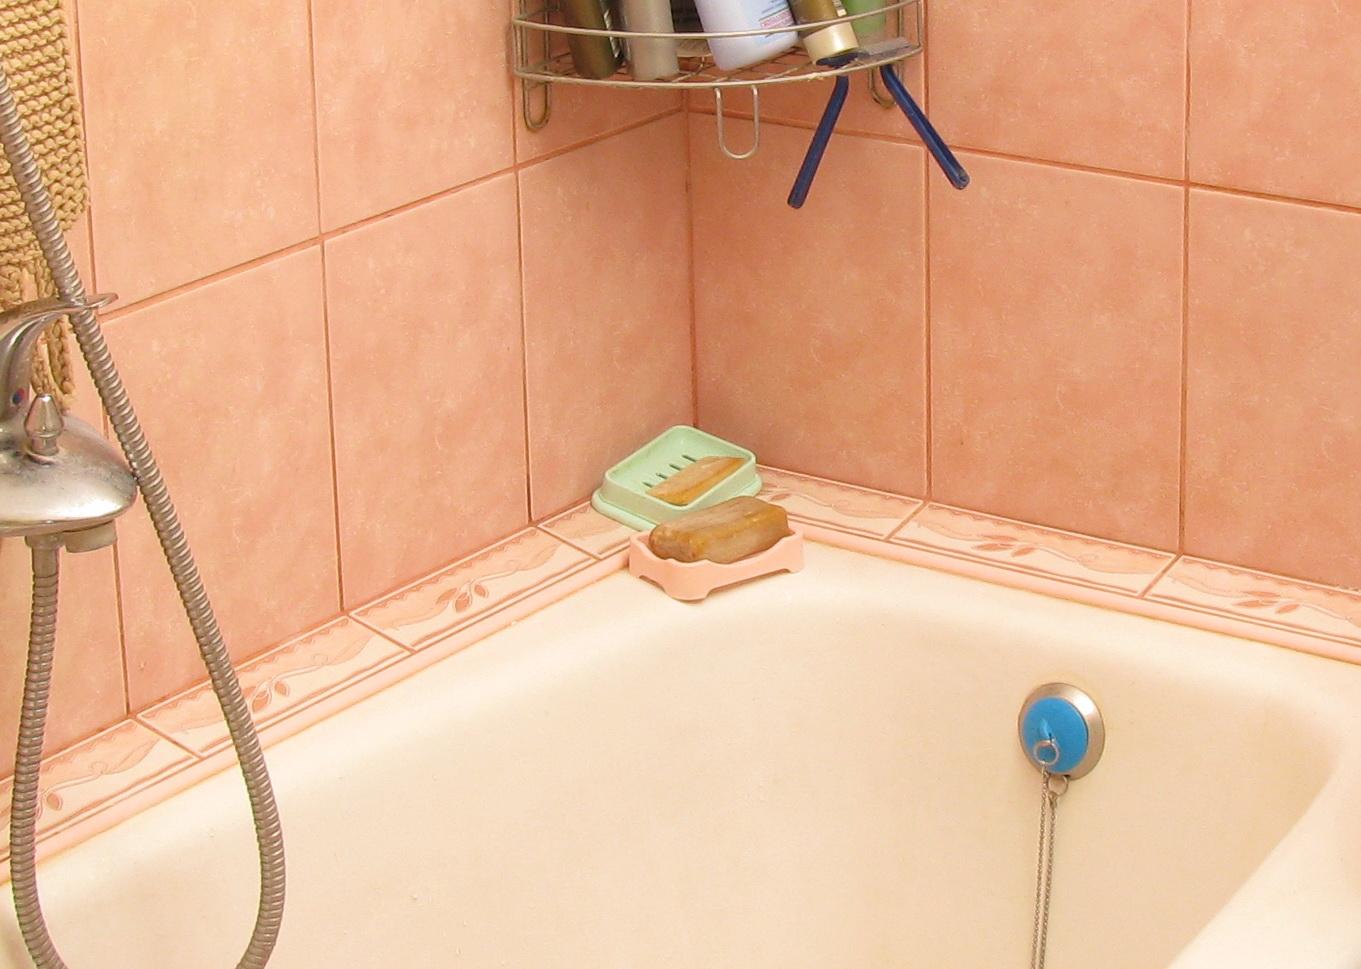 Ремонт под ключ ванных комнат, санузлов